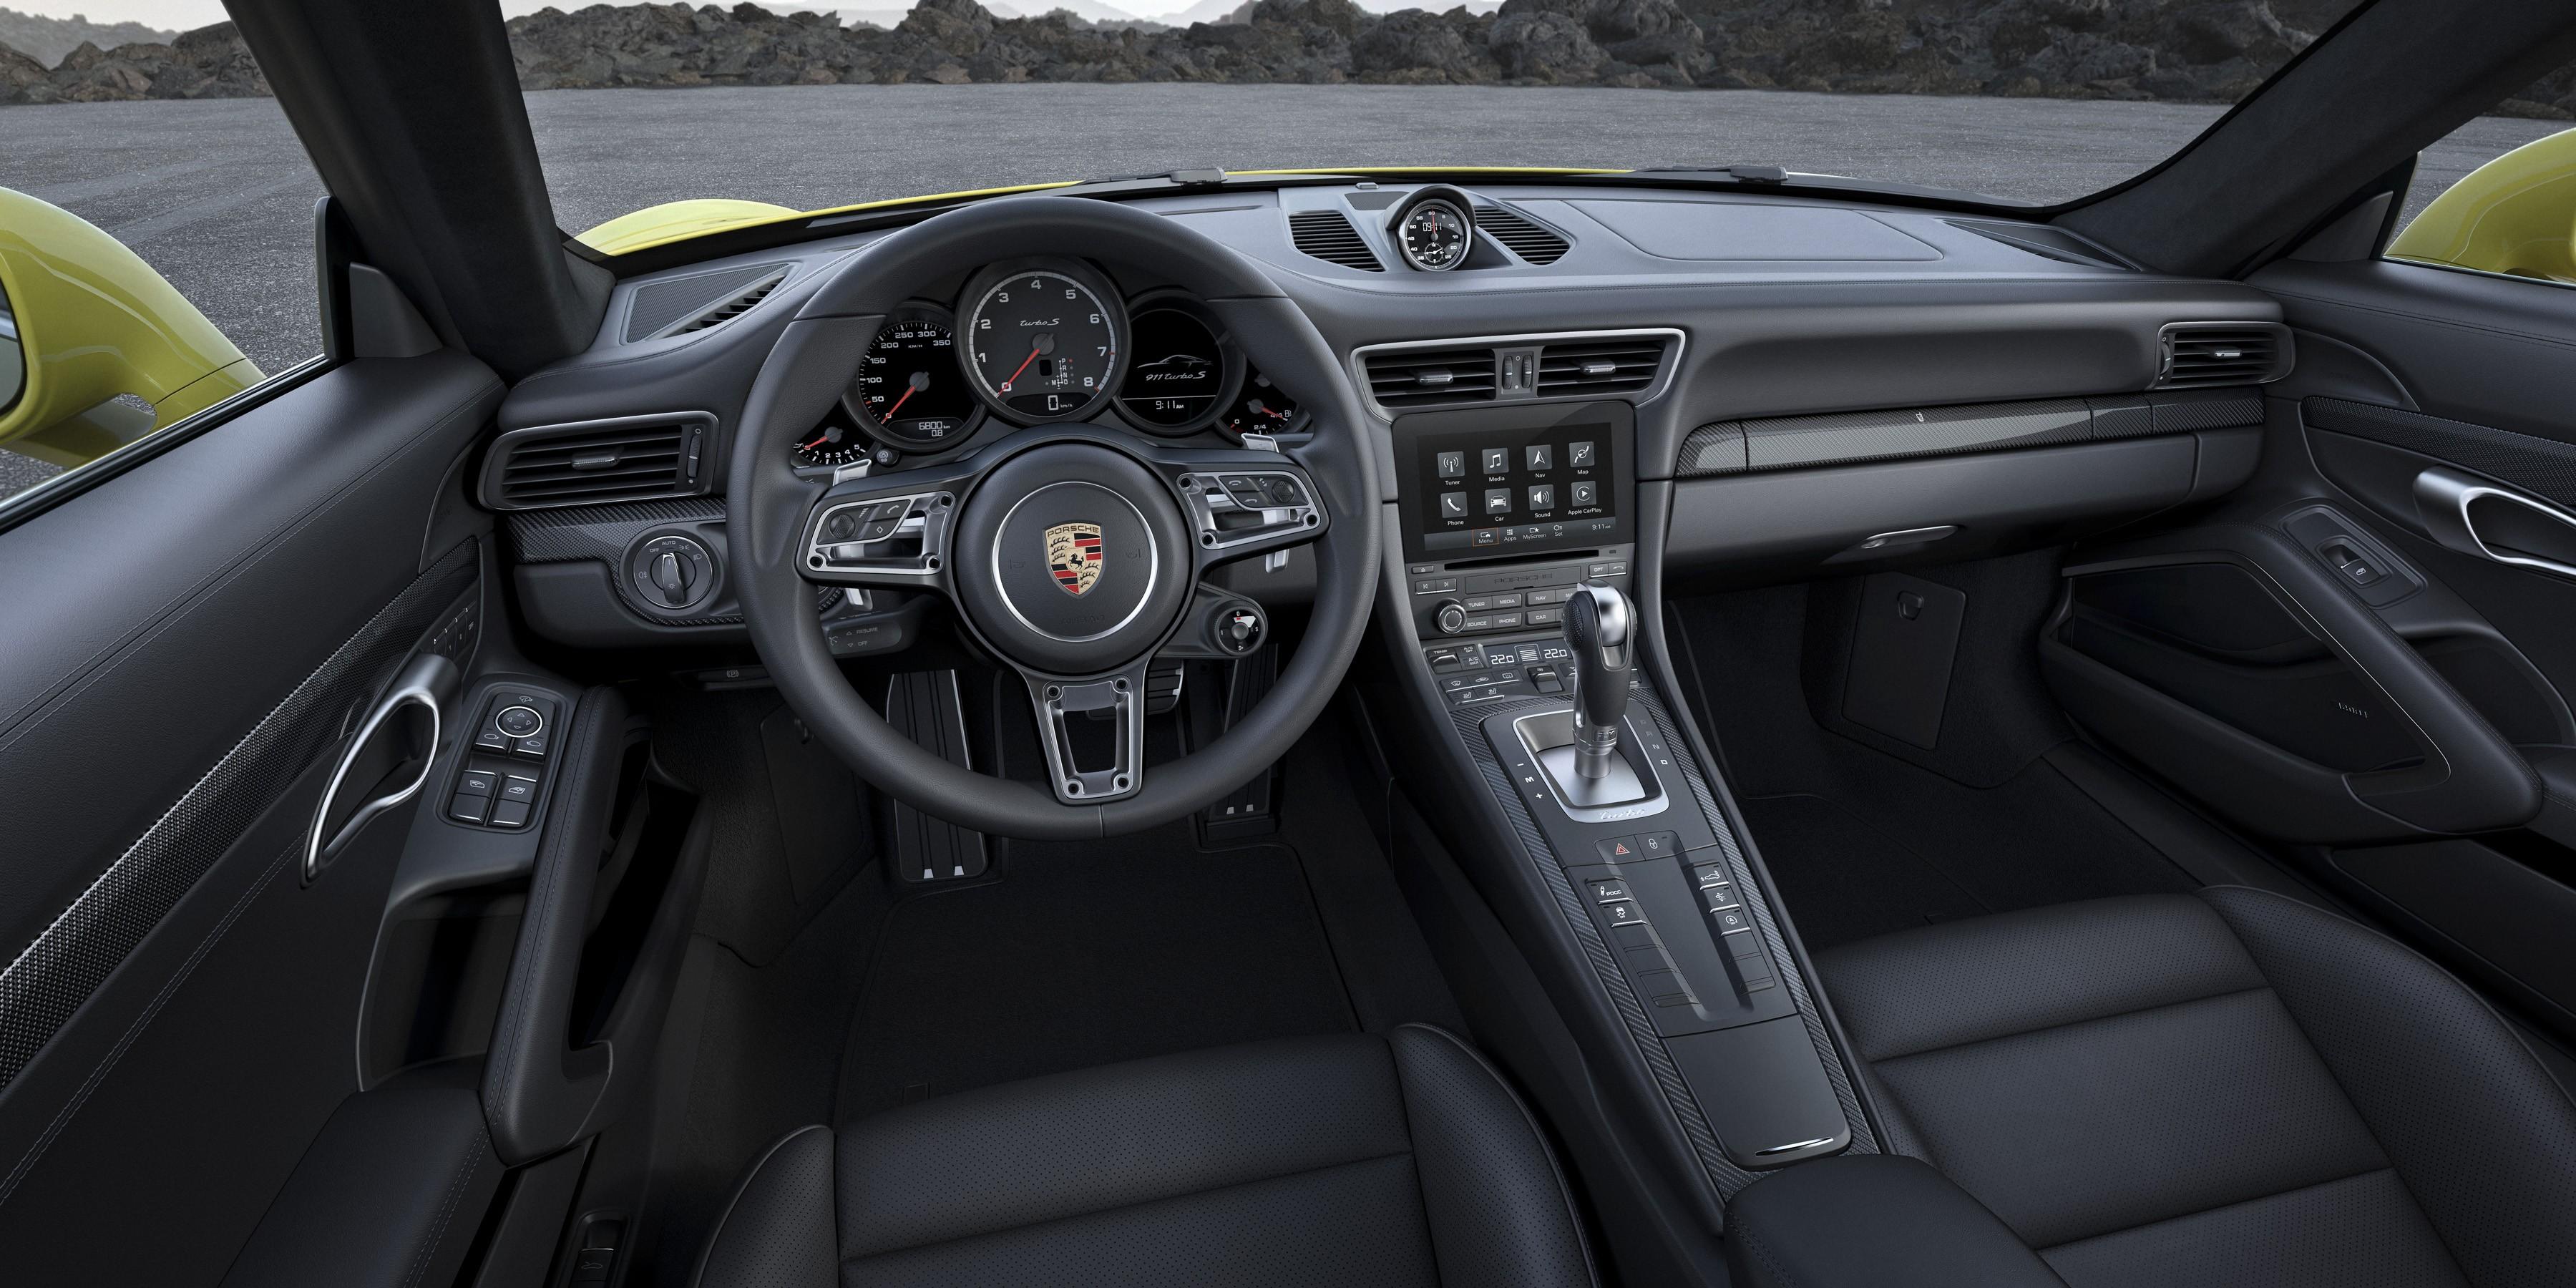 PORSCHE 911 Turbo S Cabriolet Interior